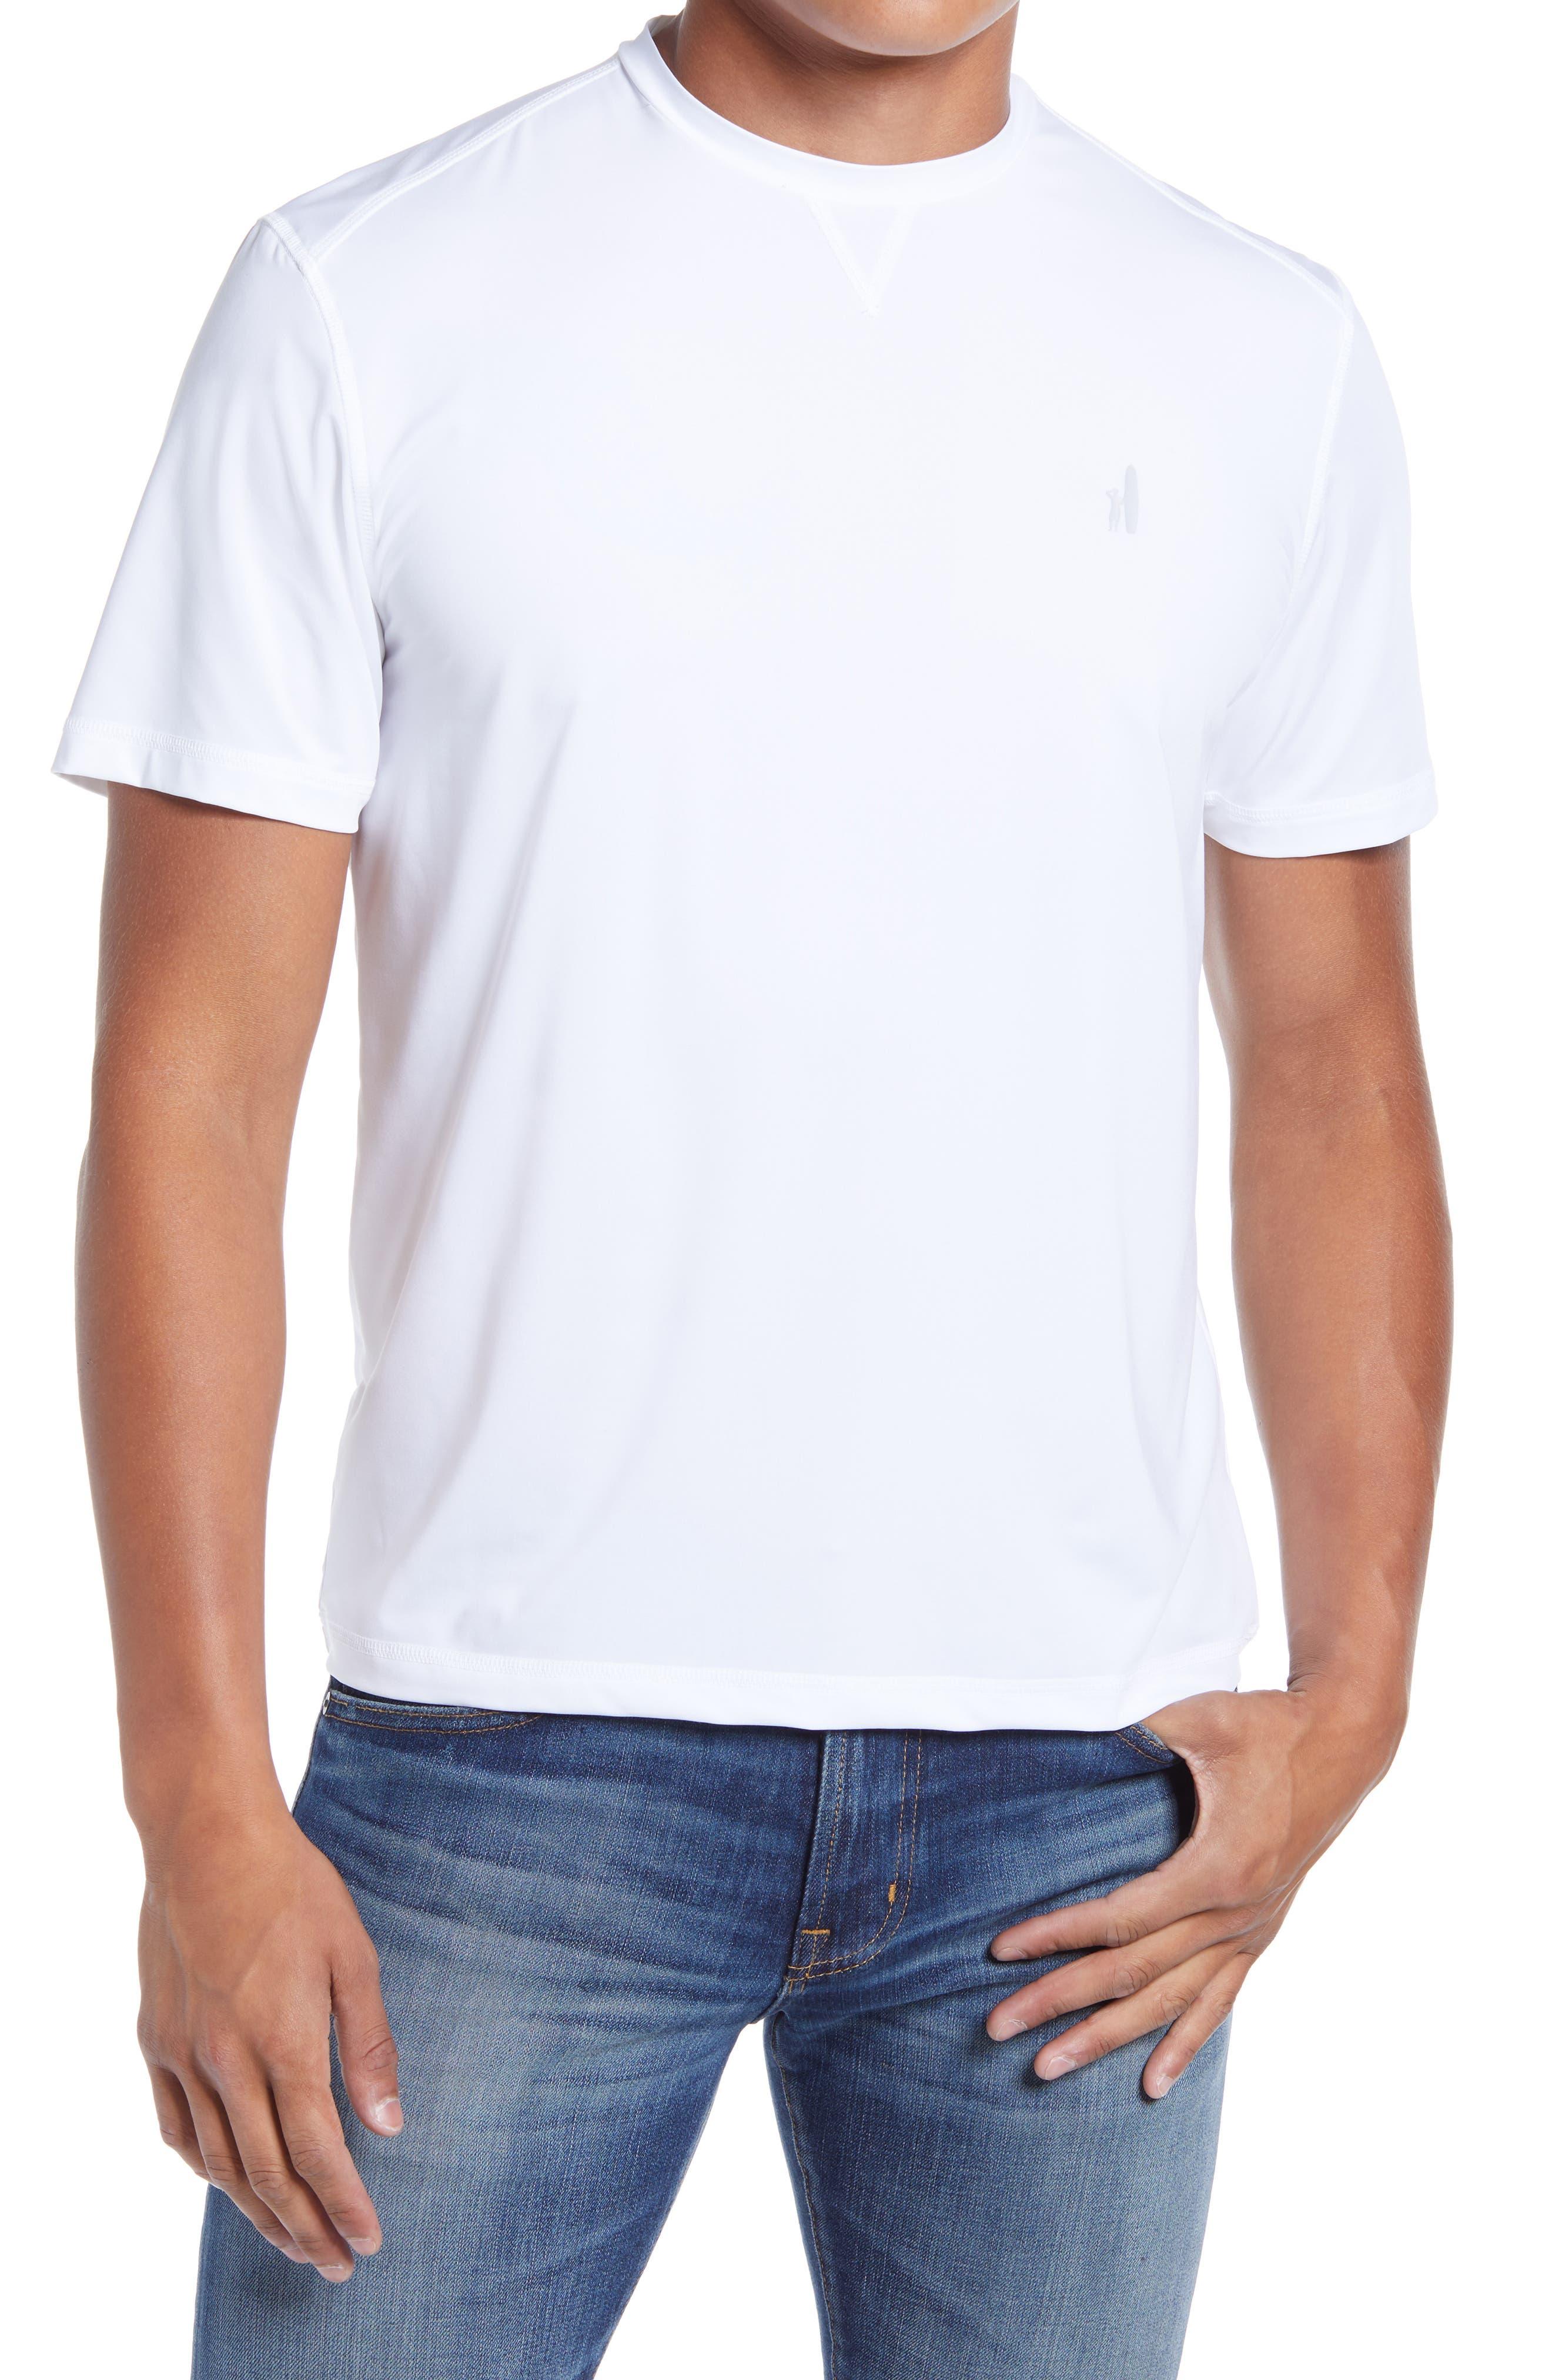 Rhodes Featherweight Performance T-Shirt